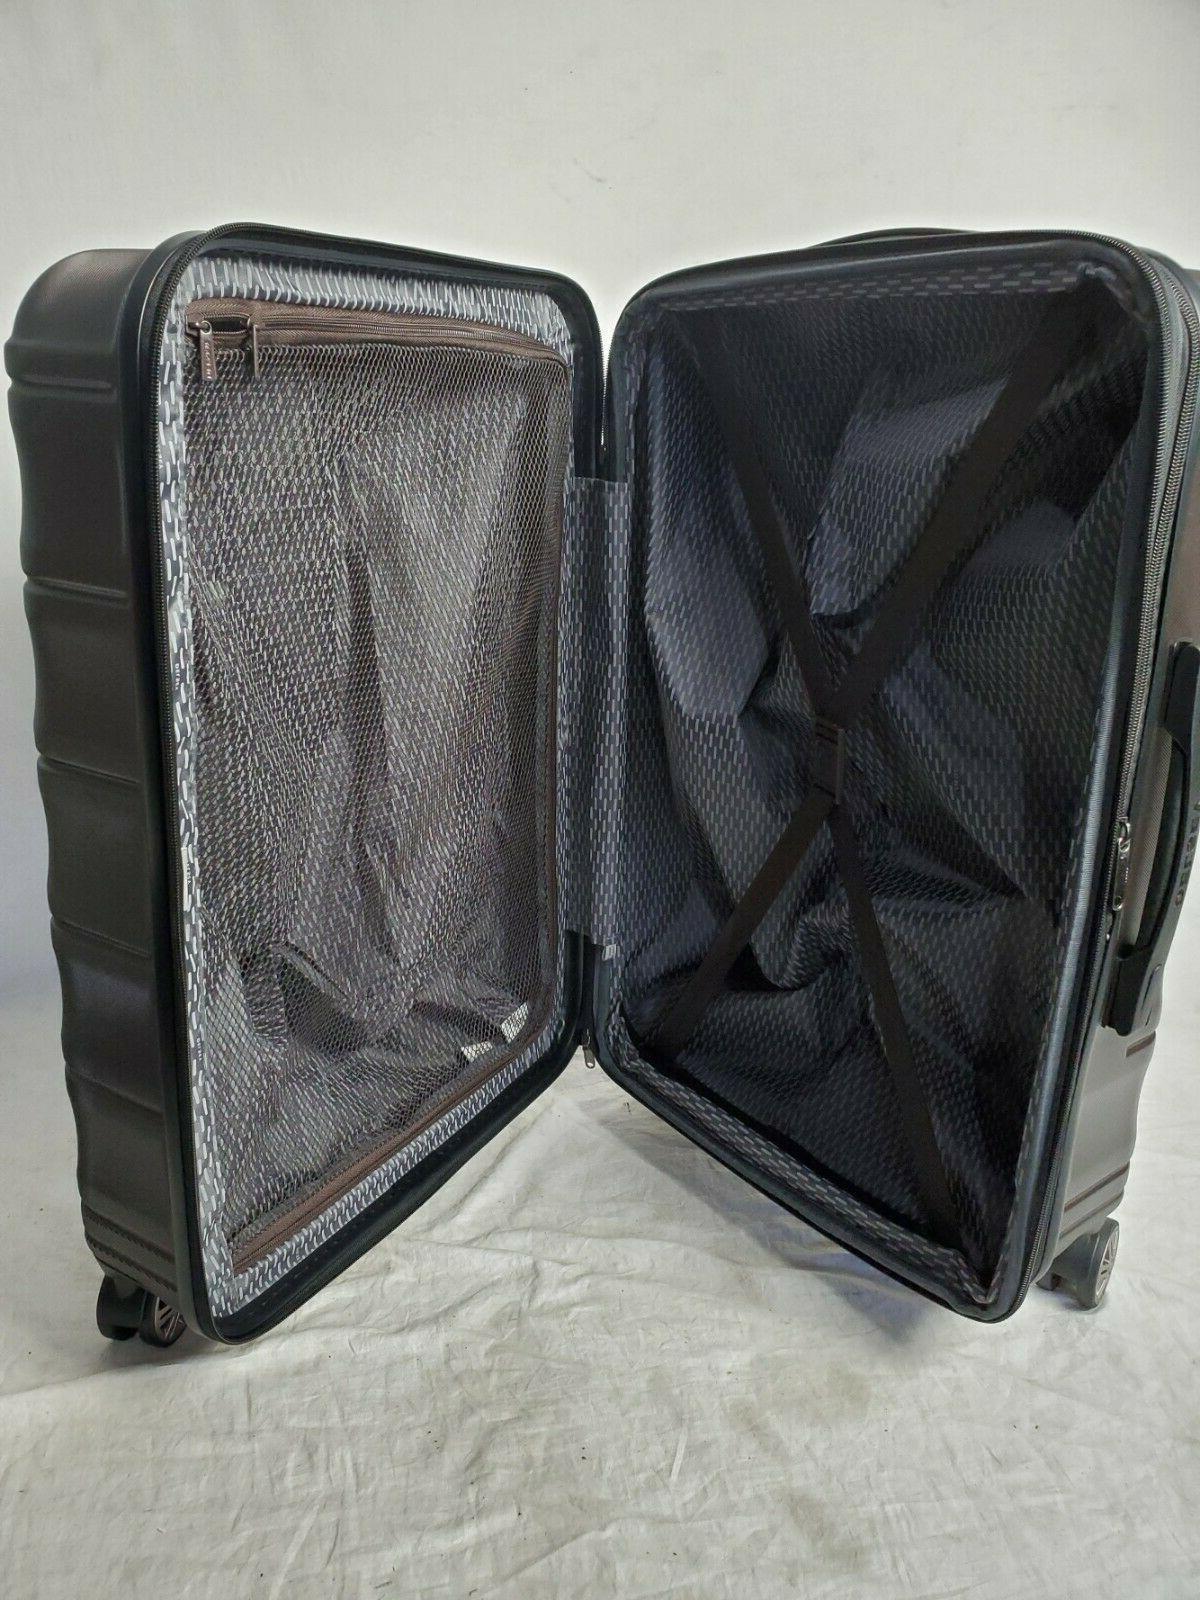 "$300 Meteor 24"" Suitcase Luggage Brown"